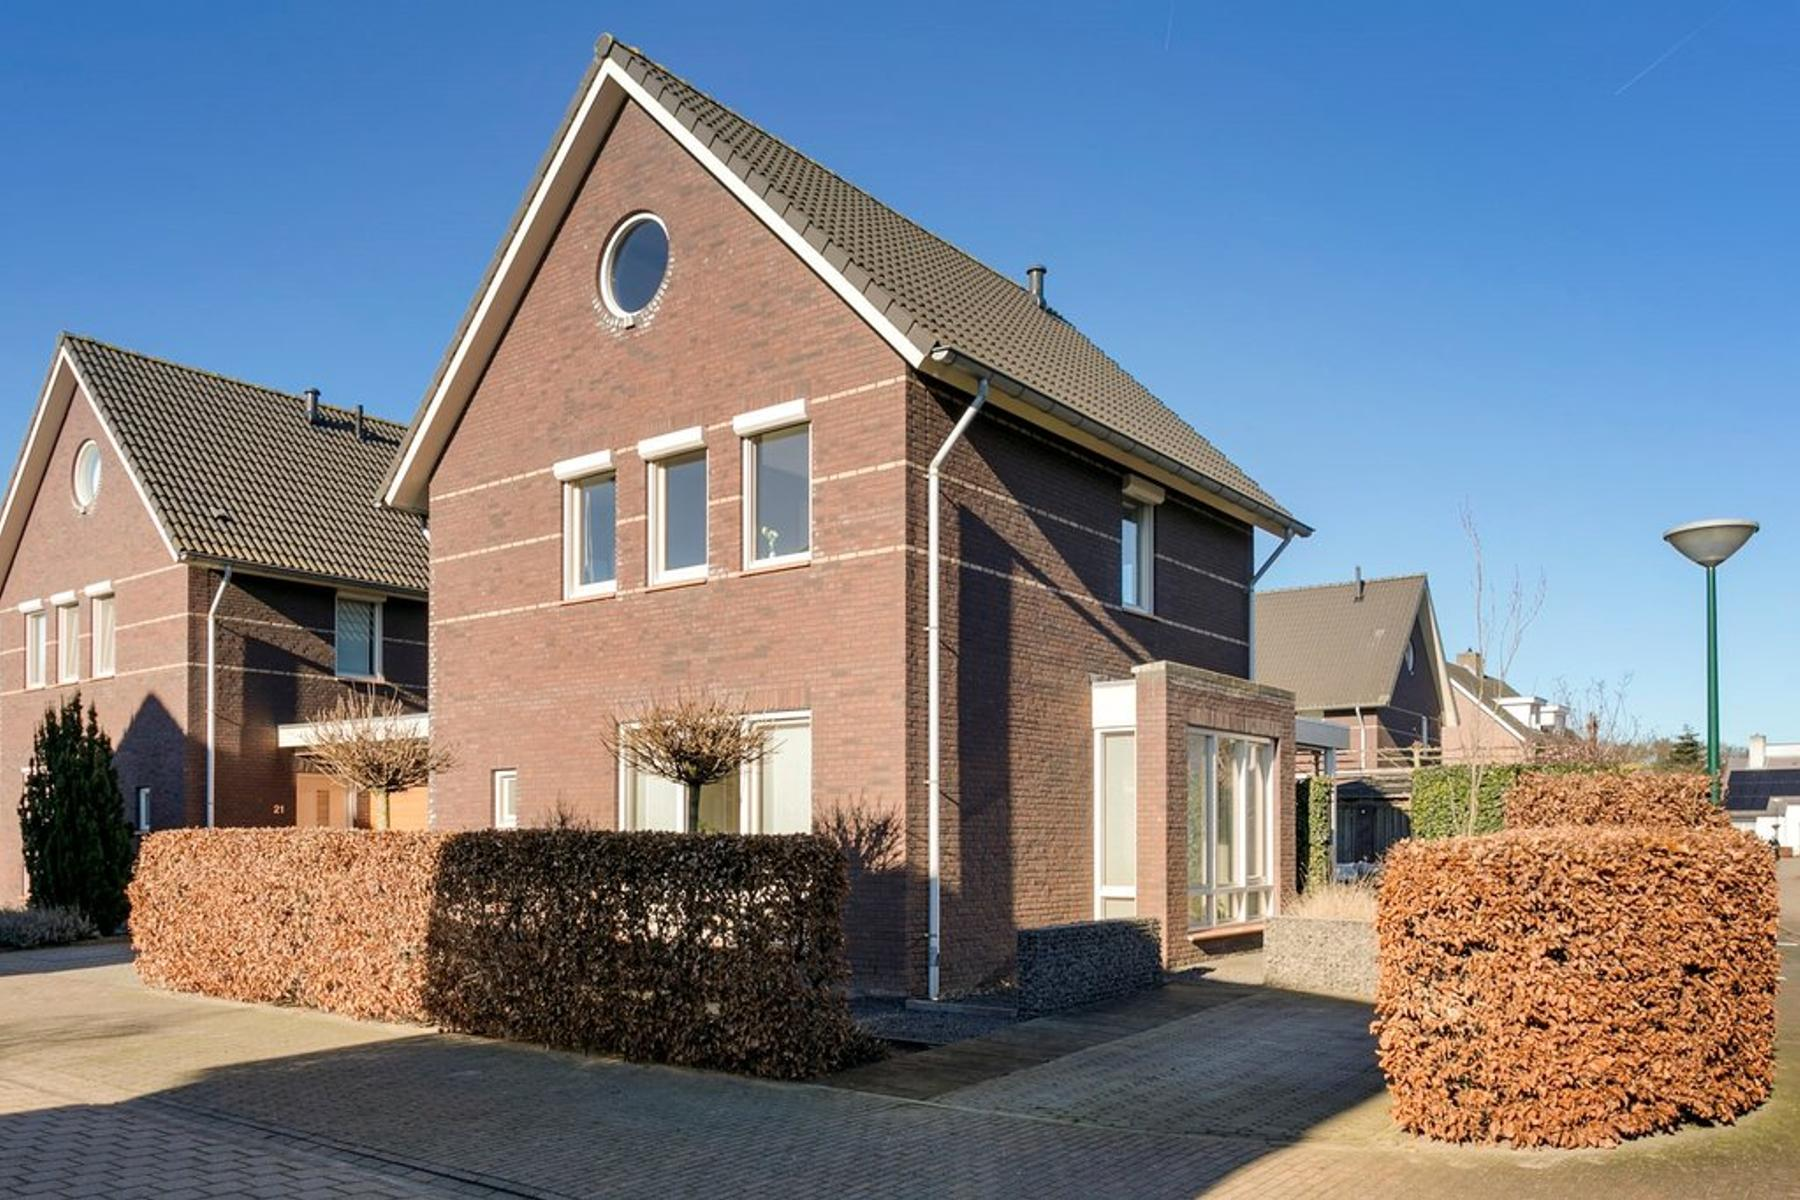 Hoefijzer 23 in Westerhoven 5563 CM